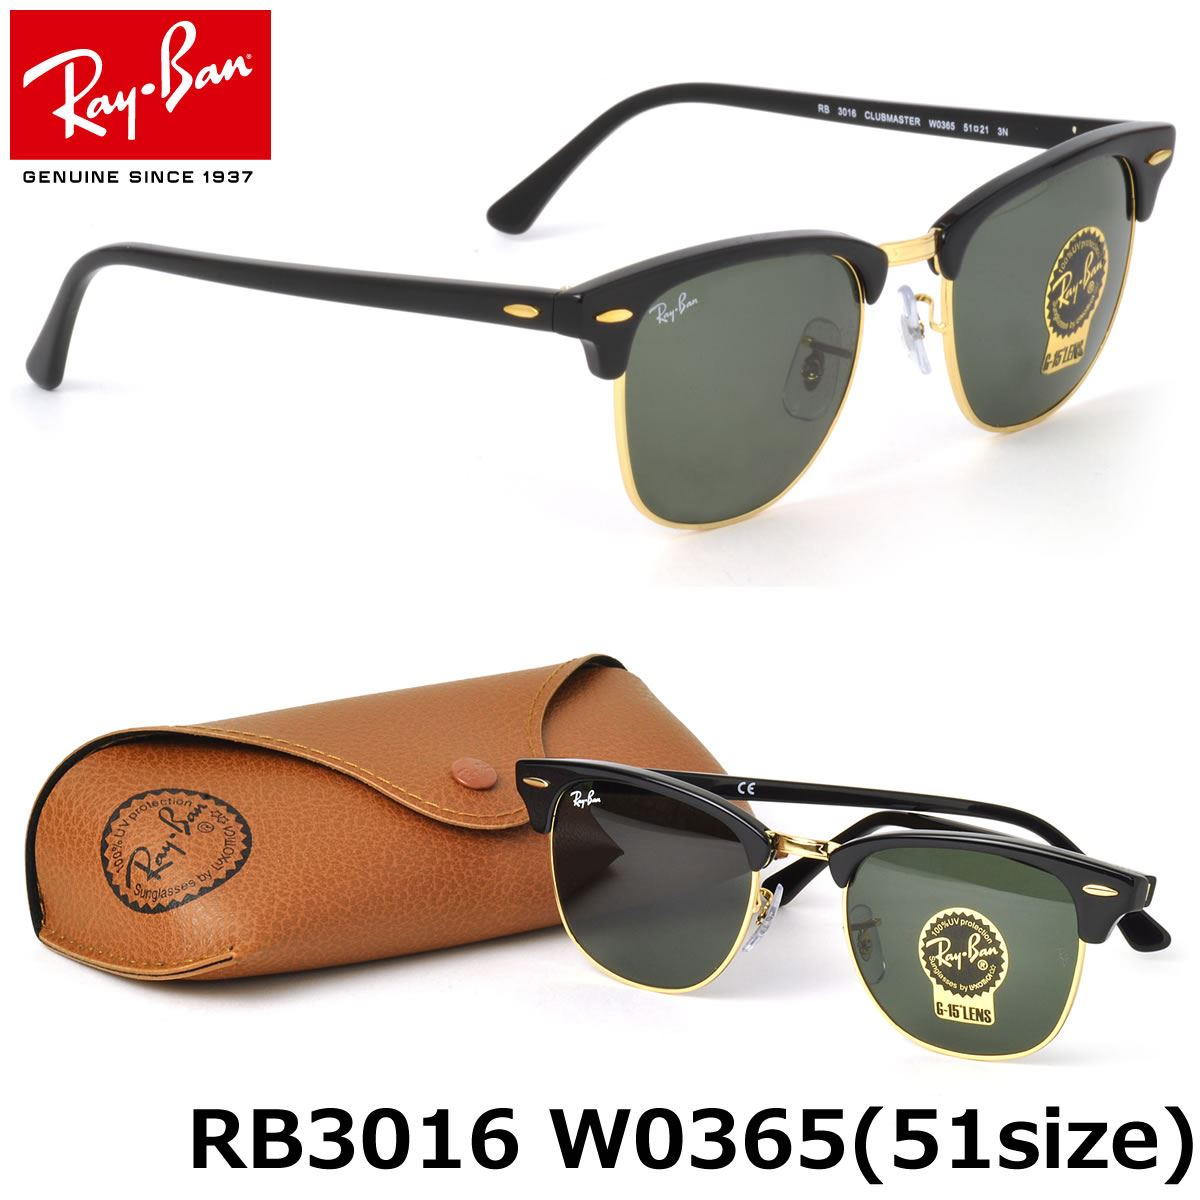 a1688832f ... closeout lentes de sol ray ban clubmaster rb3016 w0365 clasico 51mm  juntoz 64799 4448a